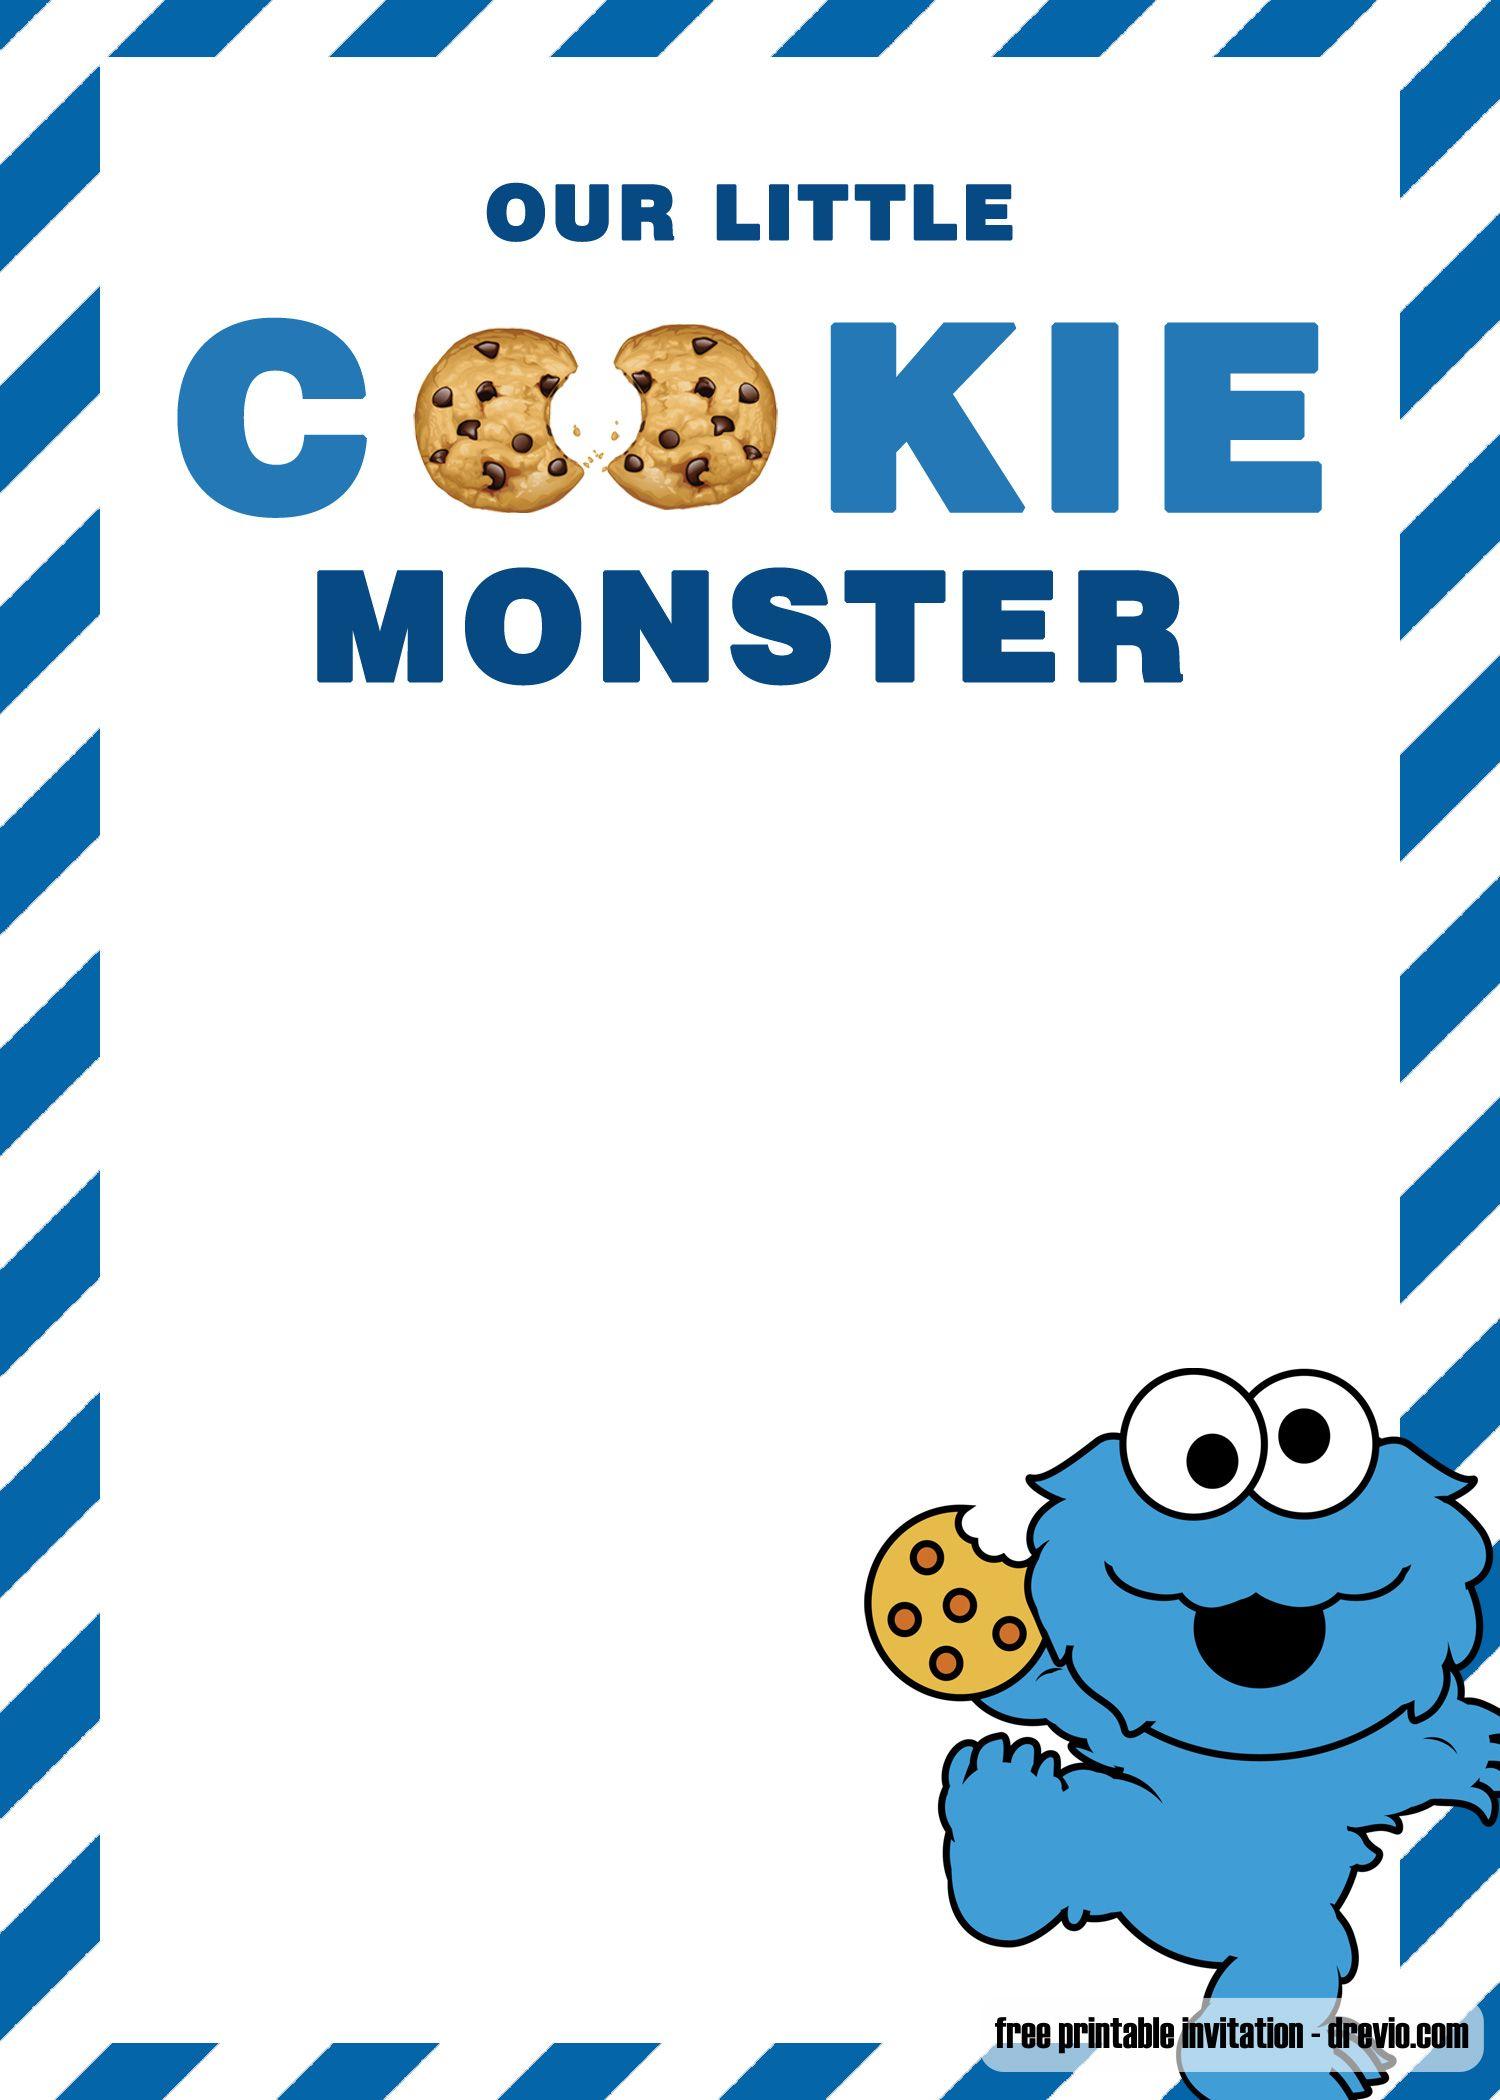 Free Cookie Monster Birthday Invitation Templates Monster Invitations Monster Baby Shower Invitations Monster Birthday Invitations